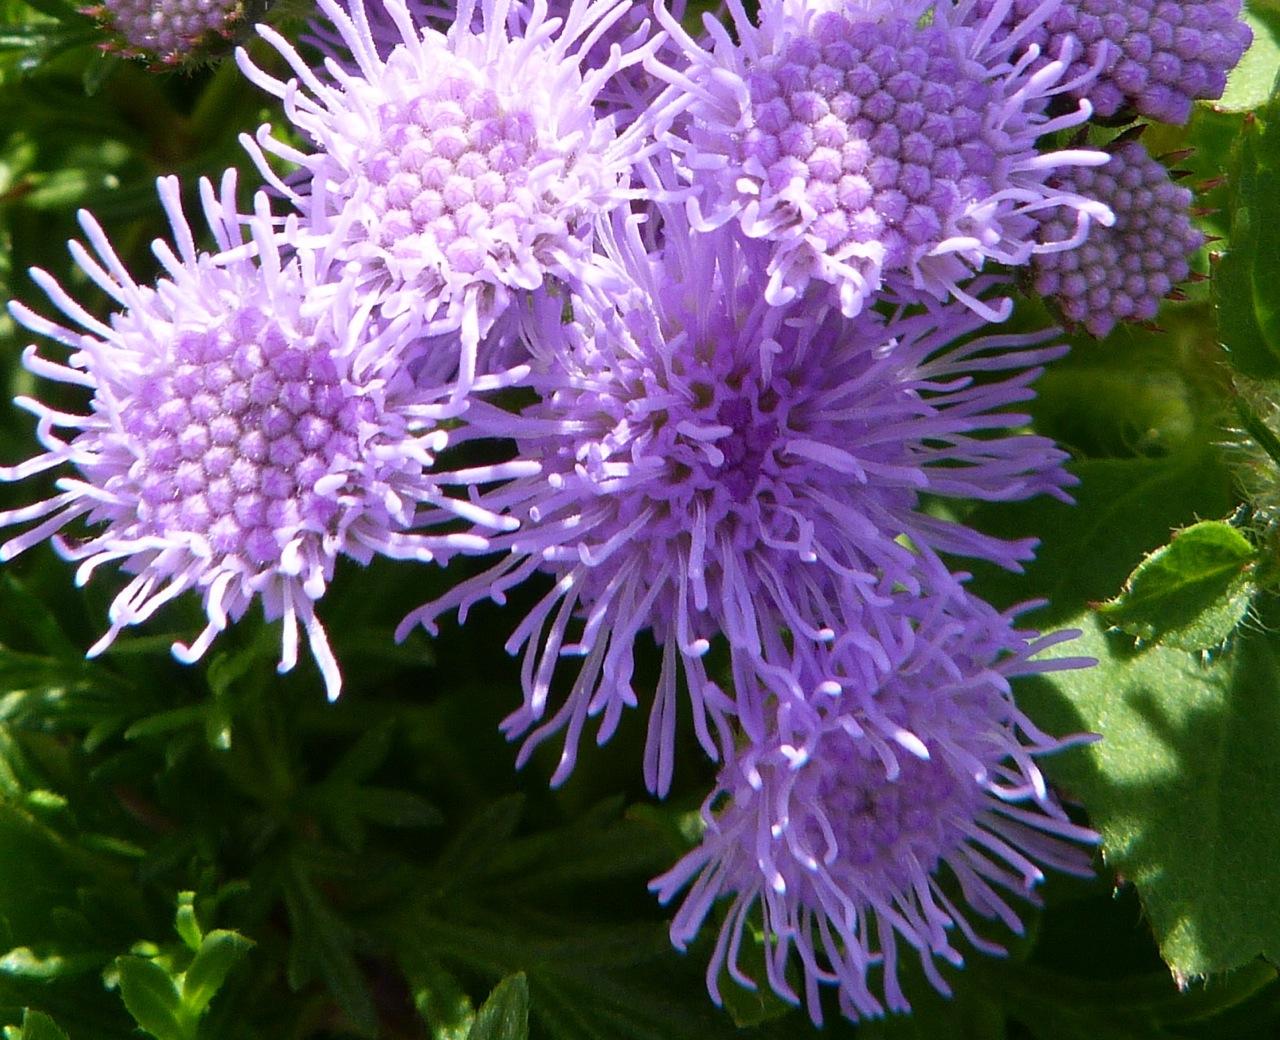 SECOND BUNCH OF FLOWERS FROM DORSET | ROLLING HARBOUR GALLERY: https://rollingharbourlife.wordpress.com/2013/07/19/a-second-bunch...